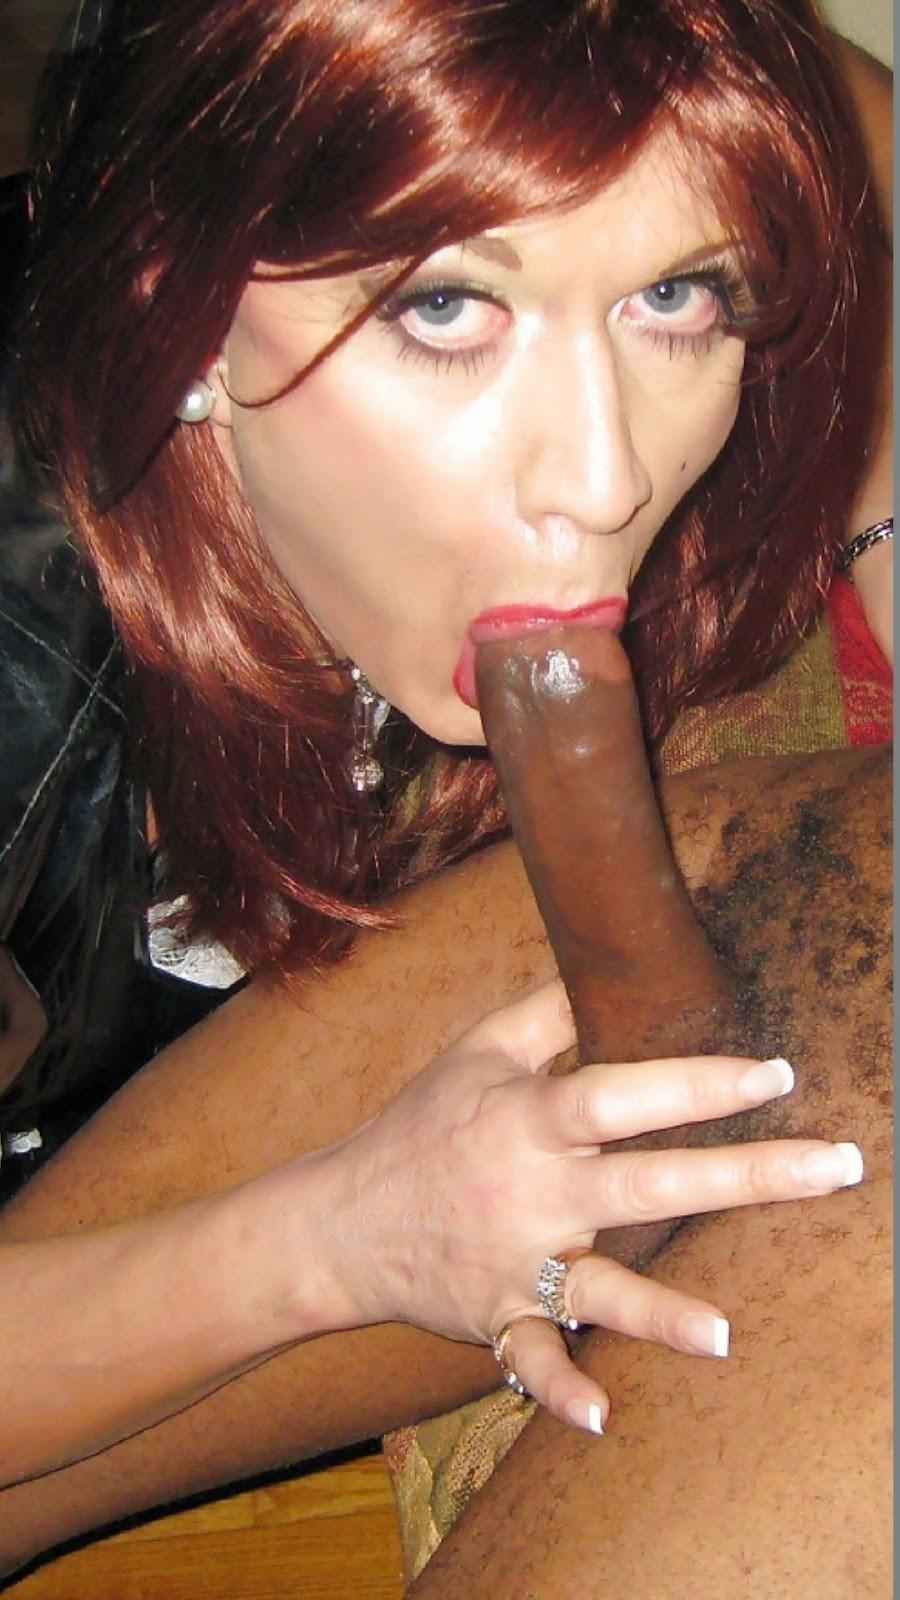 love sites,bdsm women slaves,dating love,sm tube gay